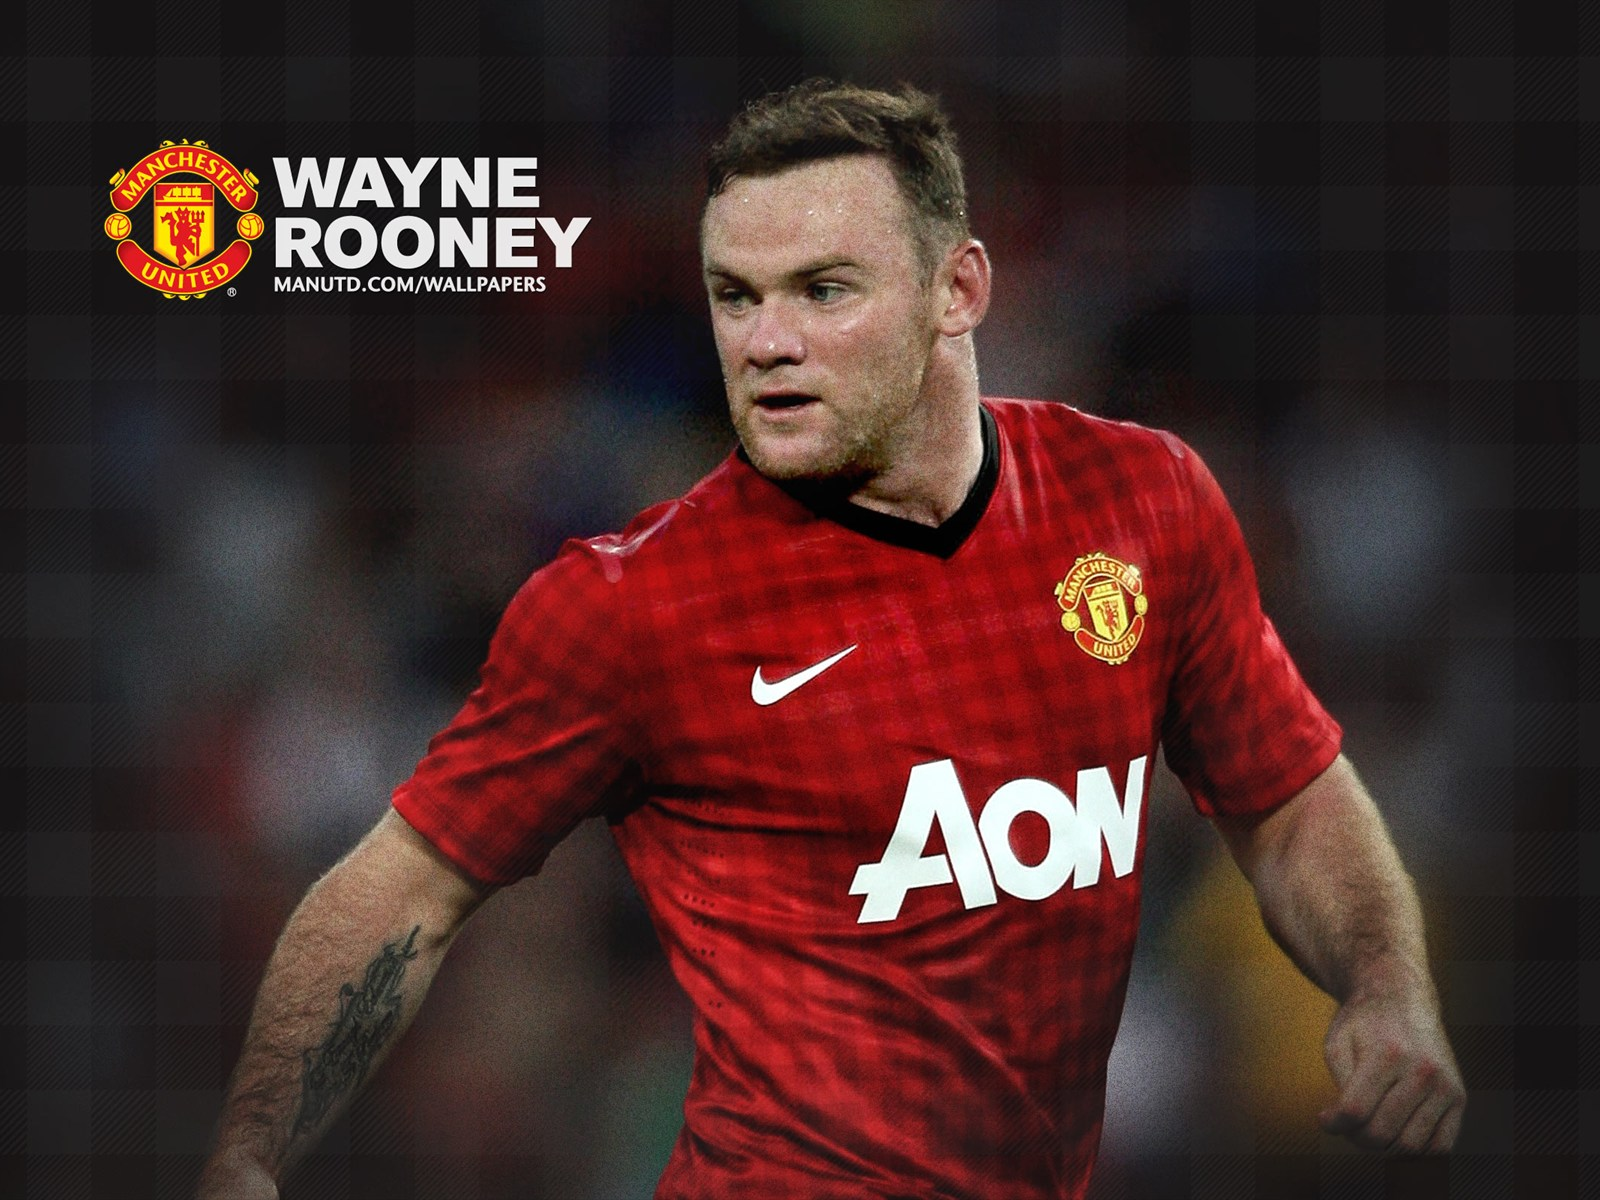 Wayne Rooney Profile